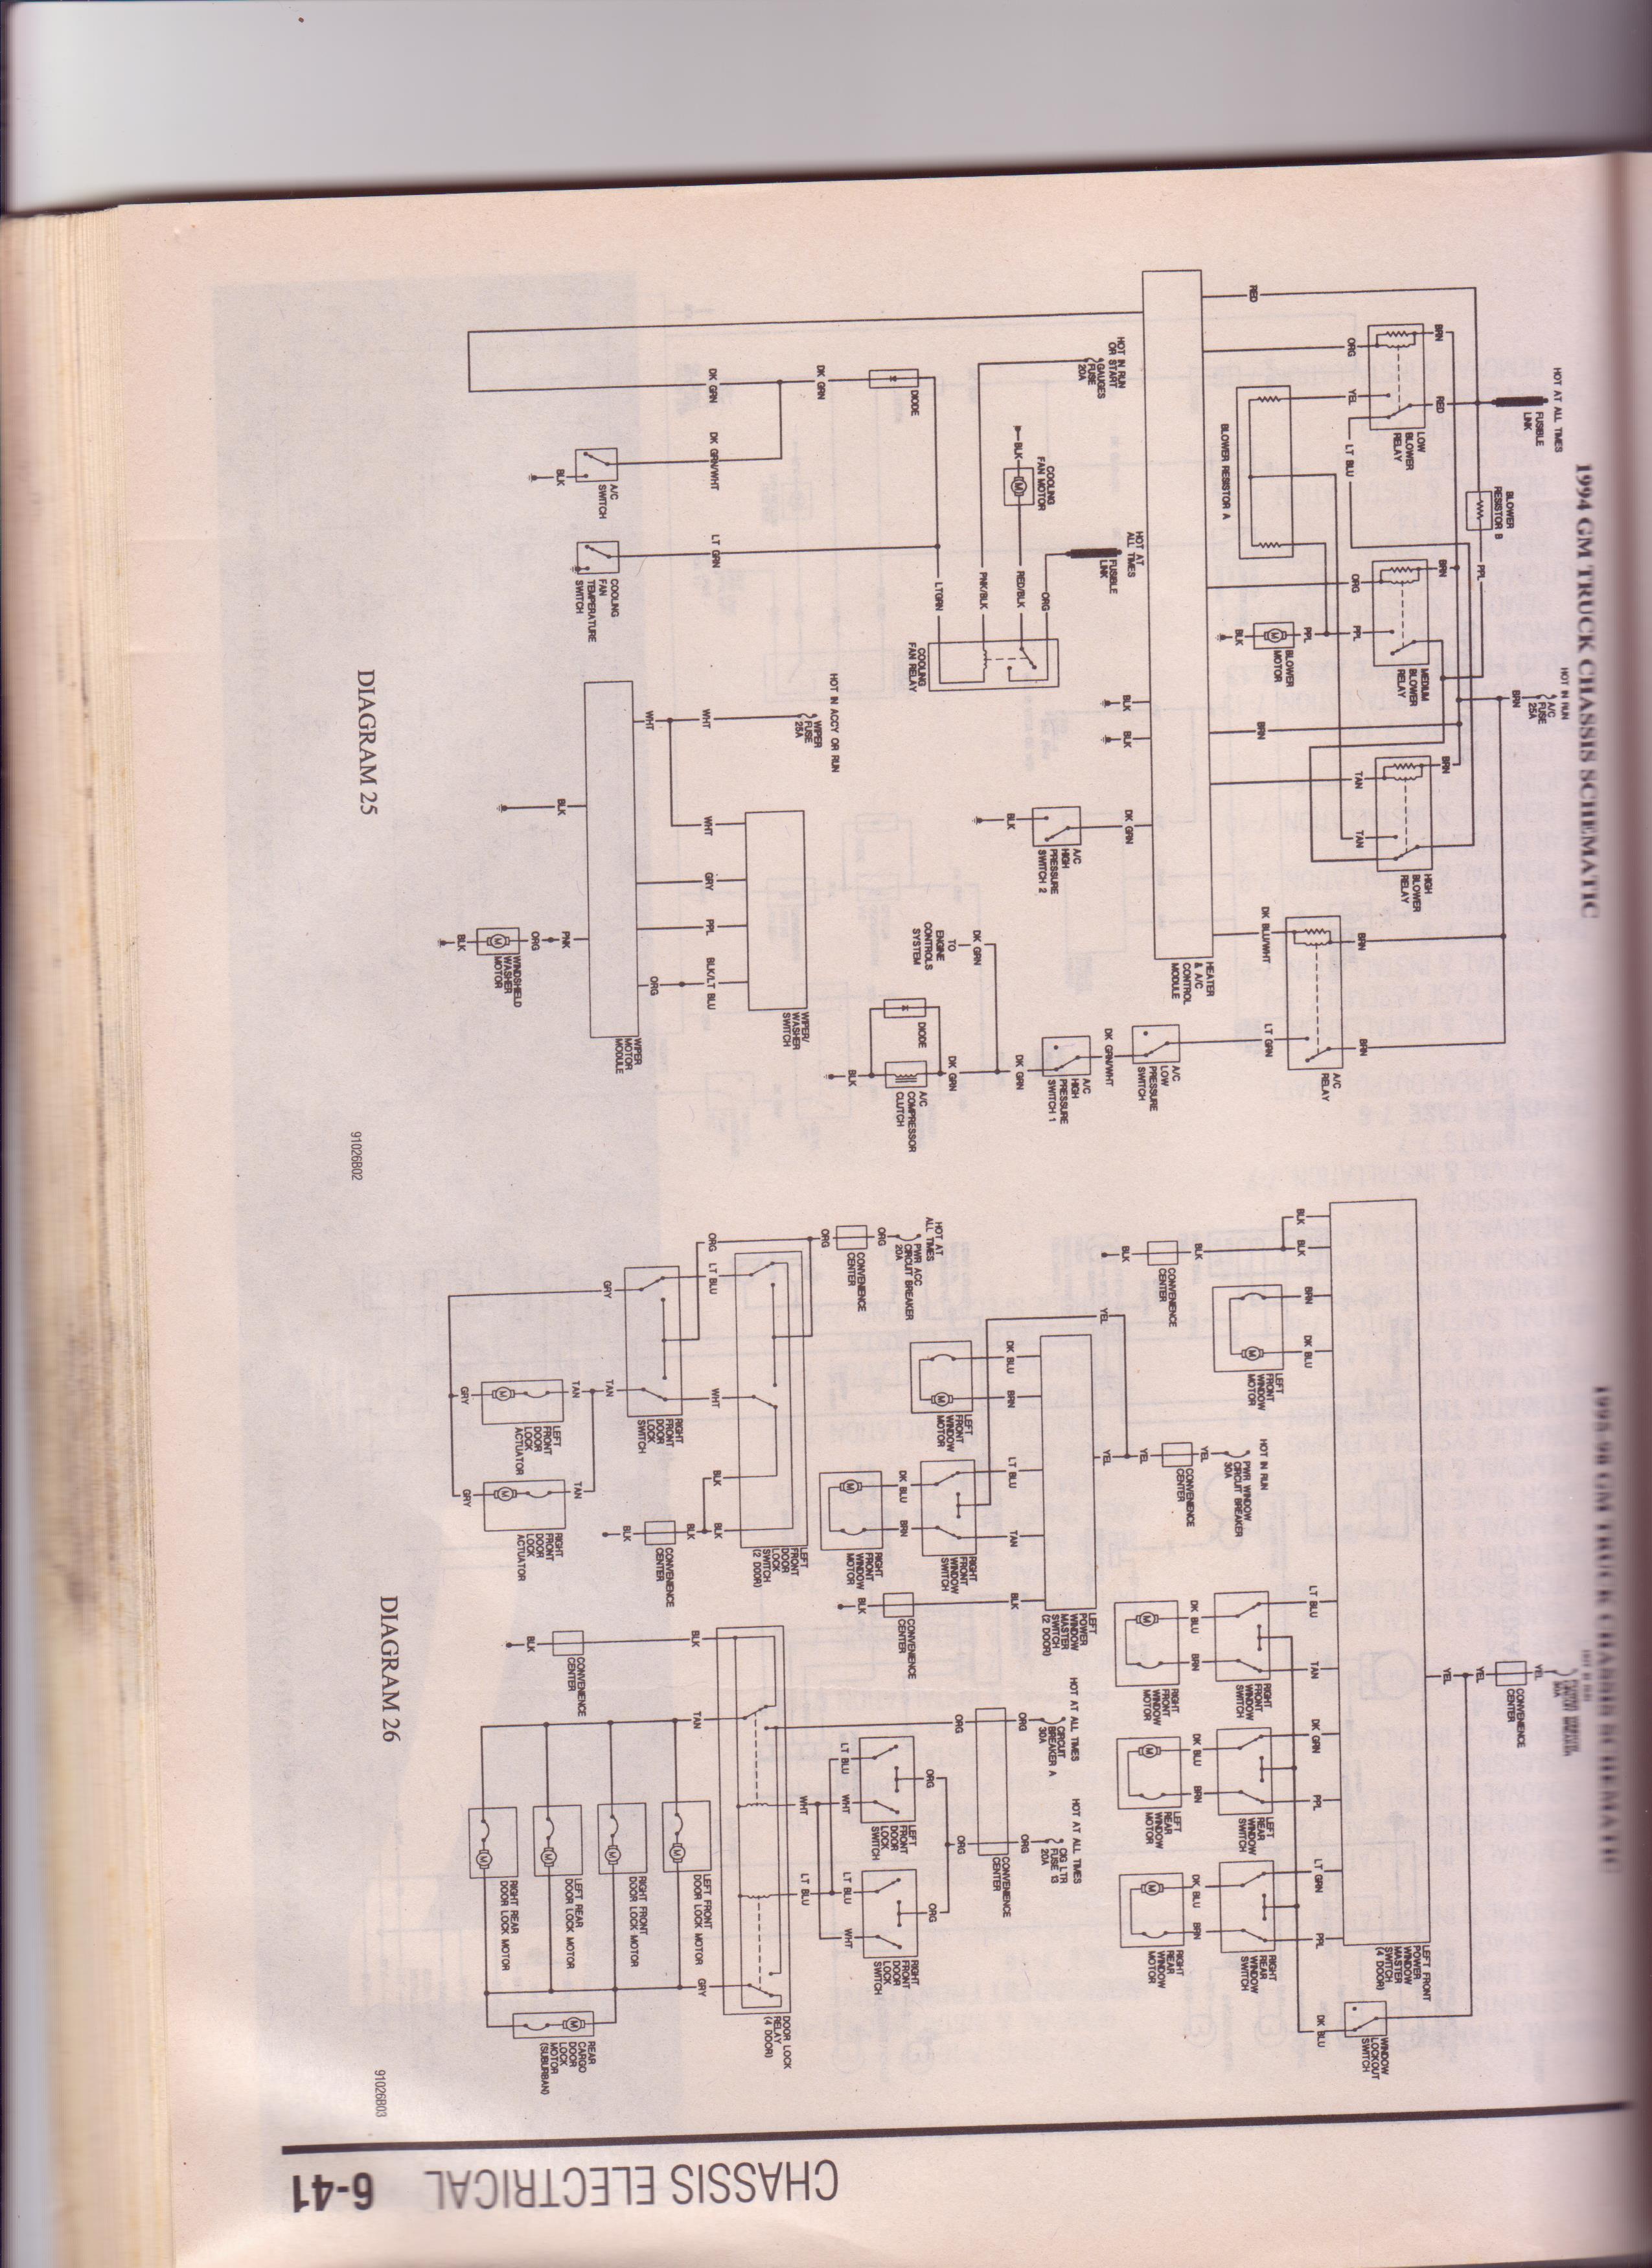 1995 Suburban Ac Wiring Free Diagram For You 93 Schematic Library Rh 78 Fahrschulehartl De 1994